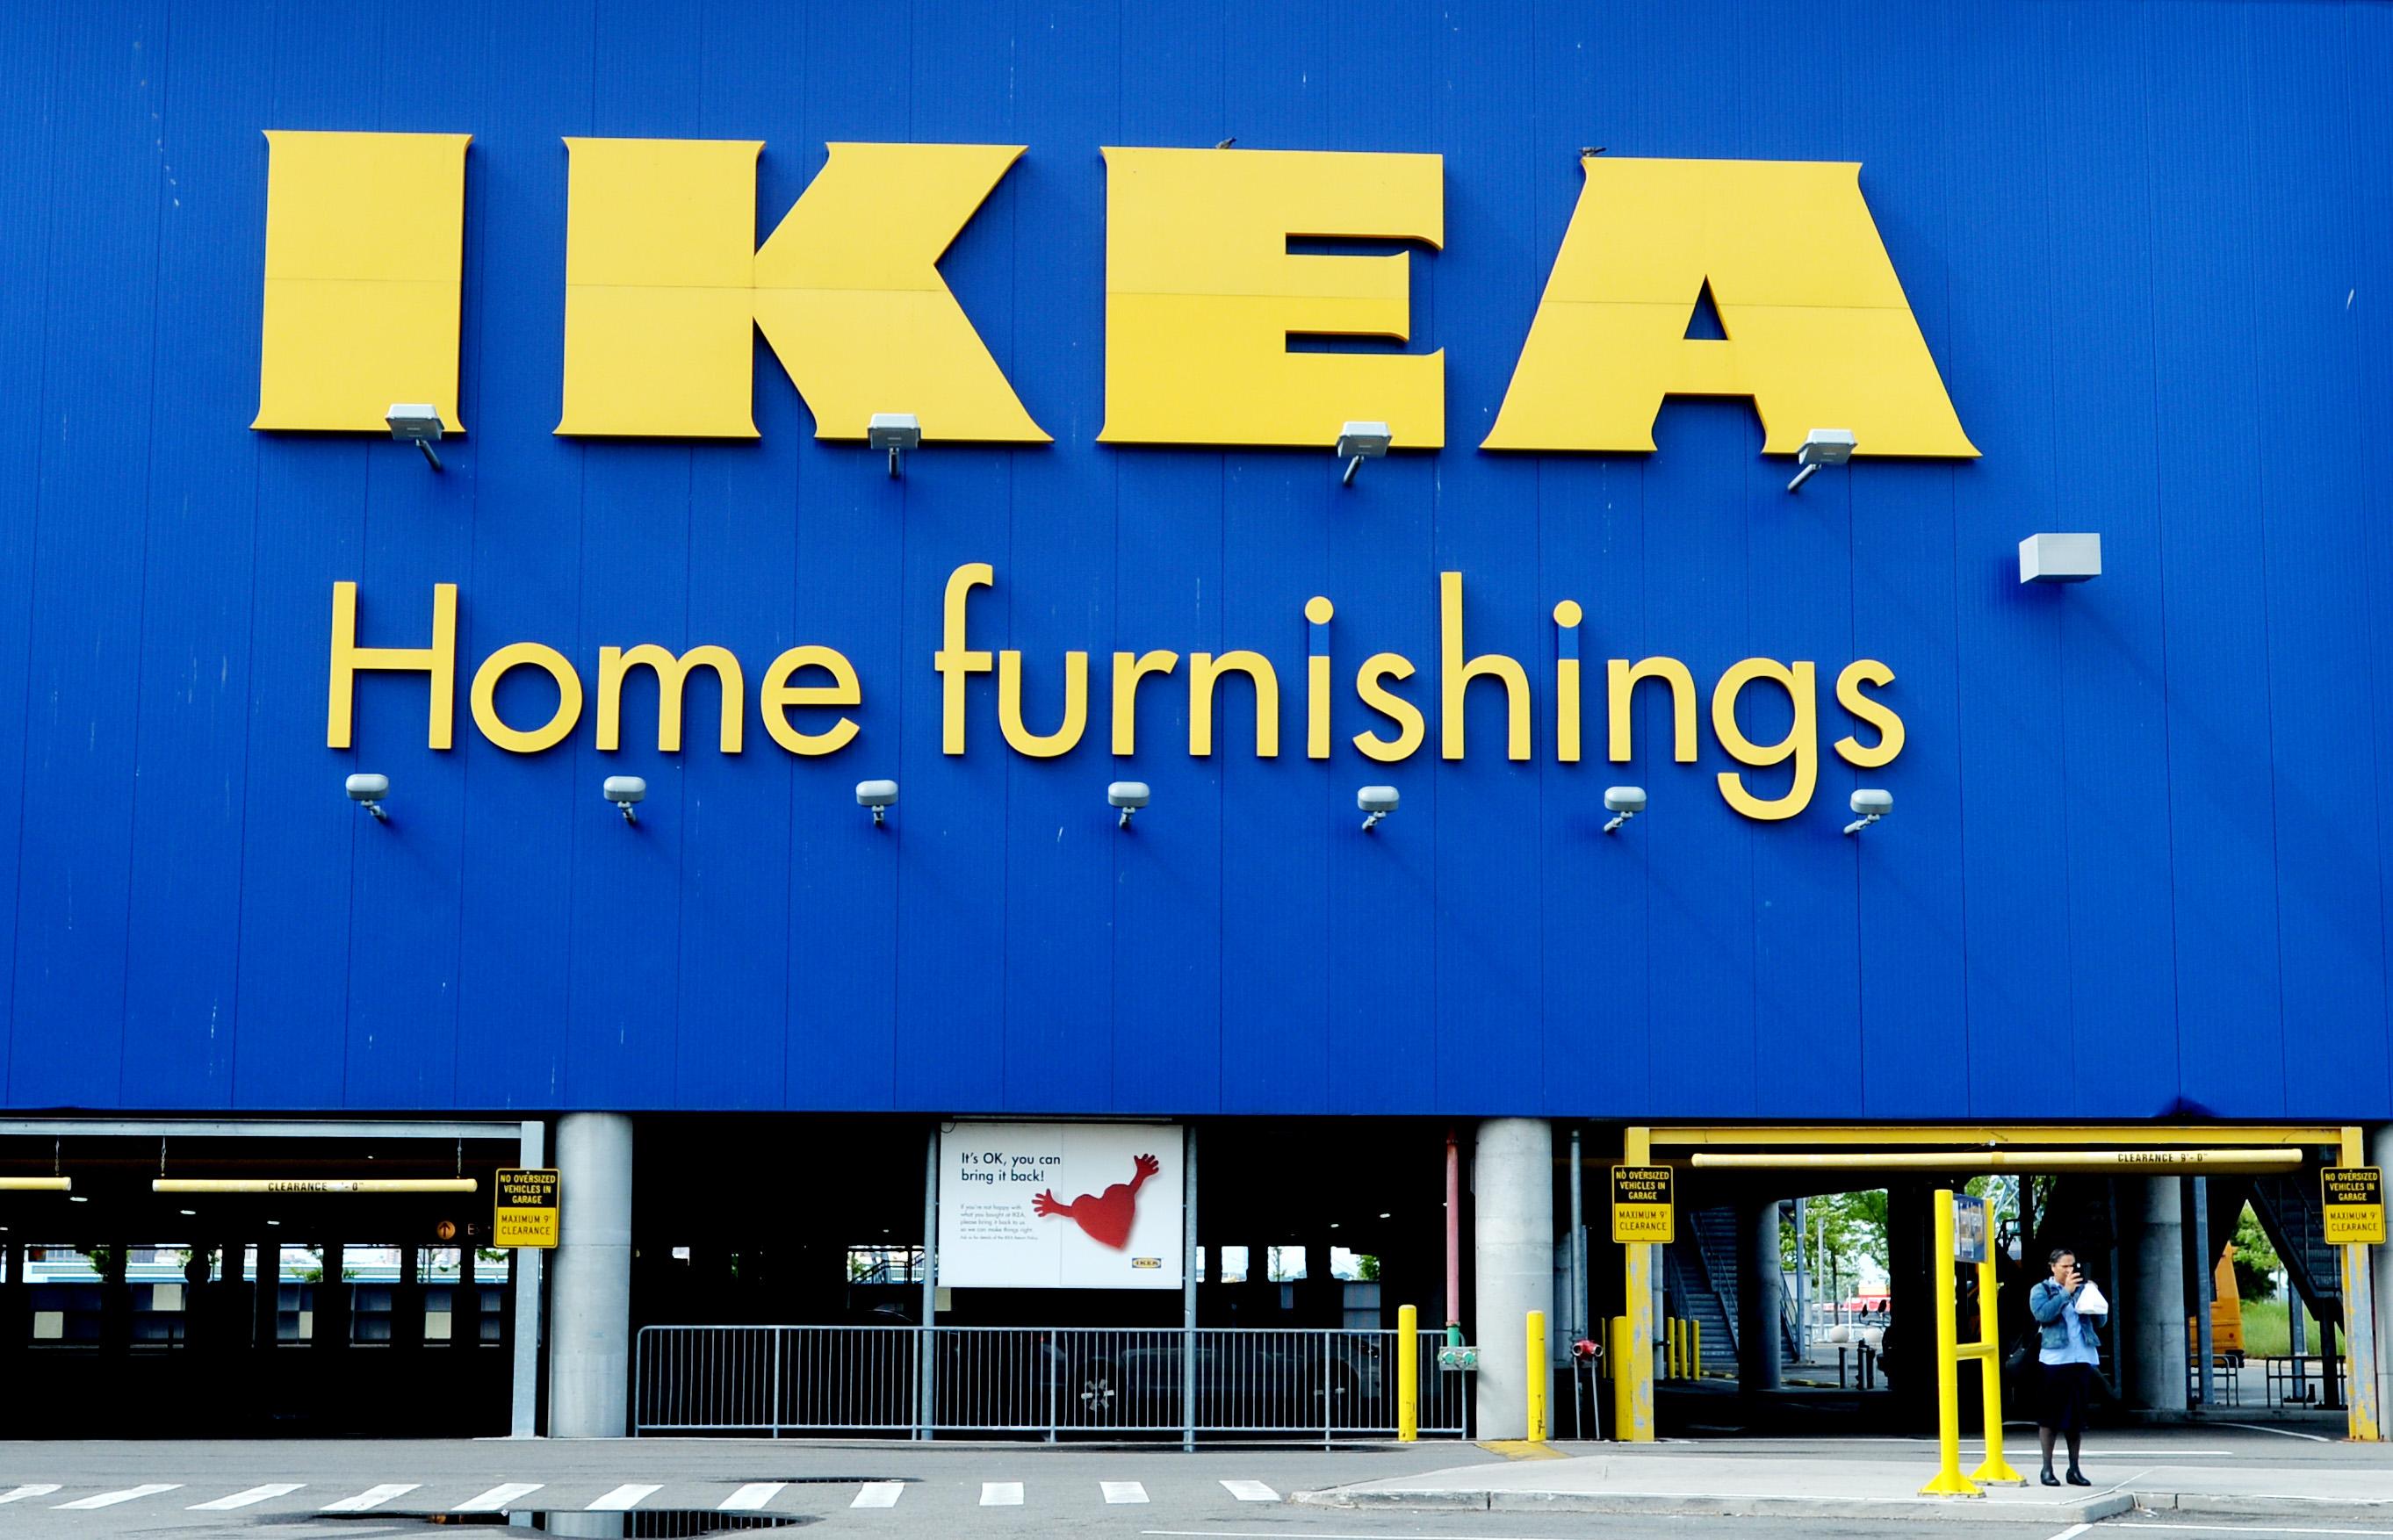 Ikeas enigmatic founder Ingvar Kamprad turns 90